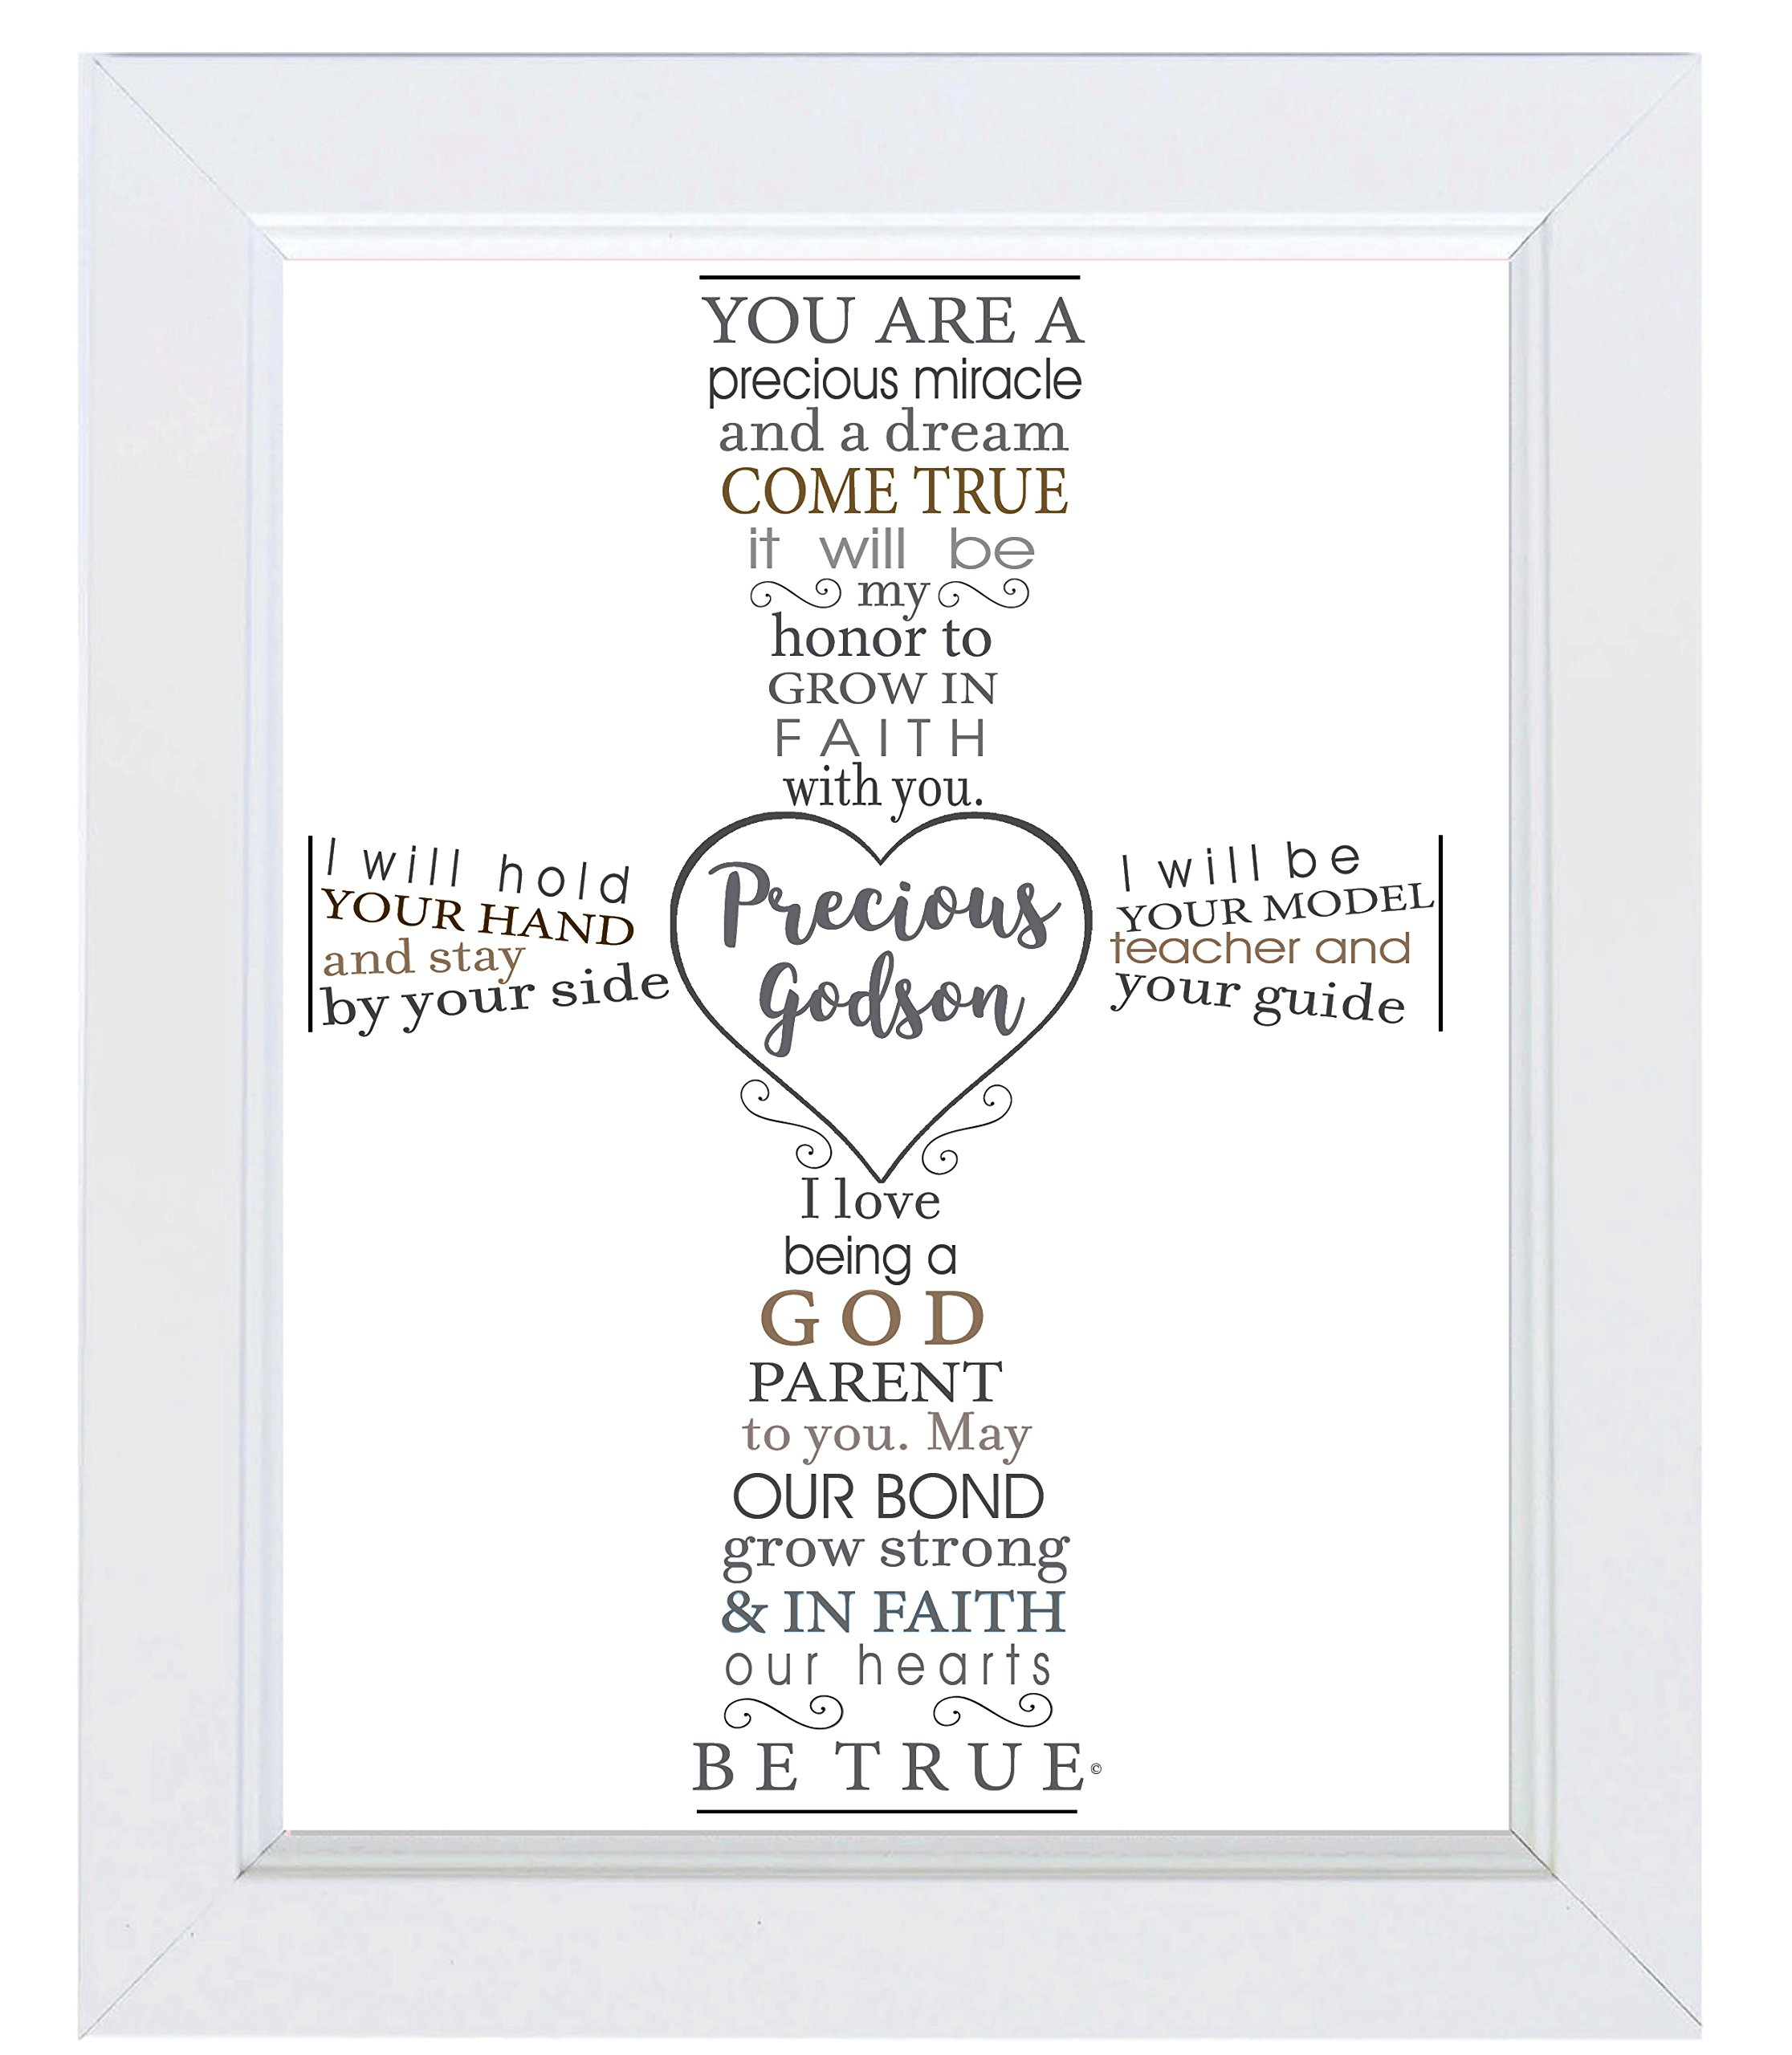 The Grandparent Gift Precious Godson Frame Baptism or Christening Gift from Godparent, White by The Grandparent Gift Co.